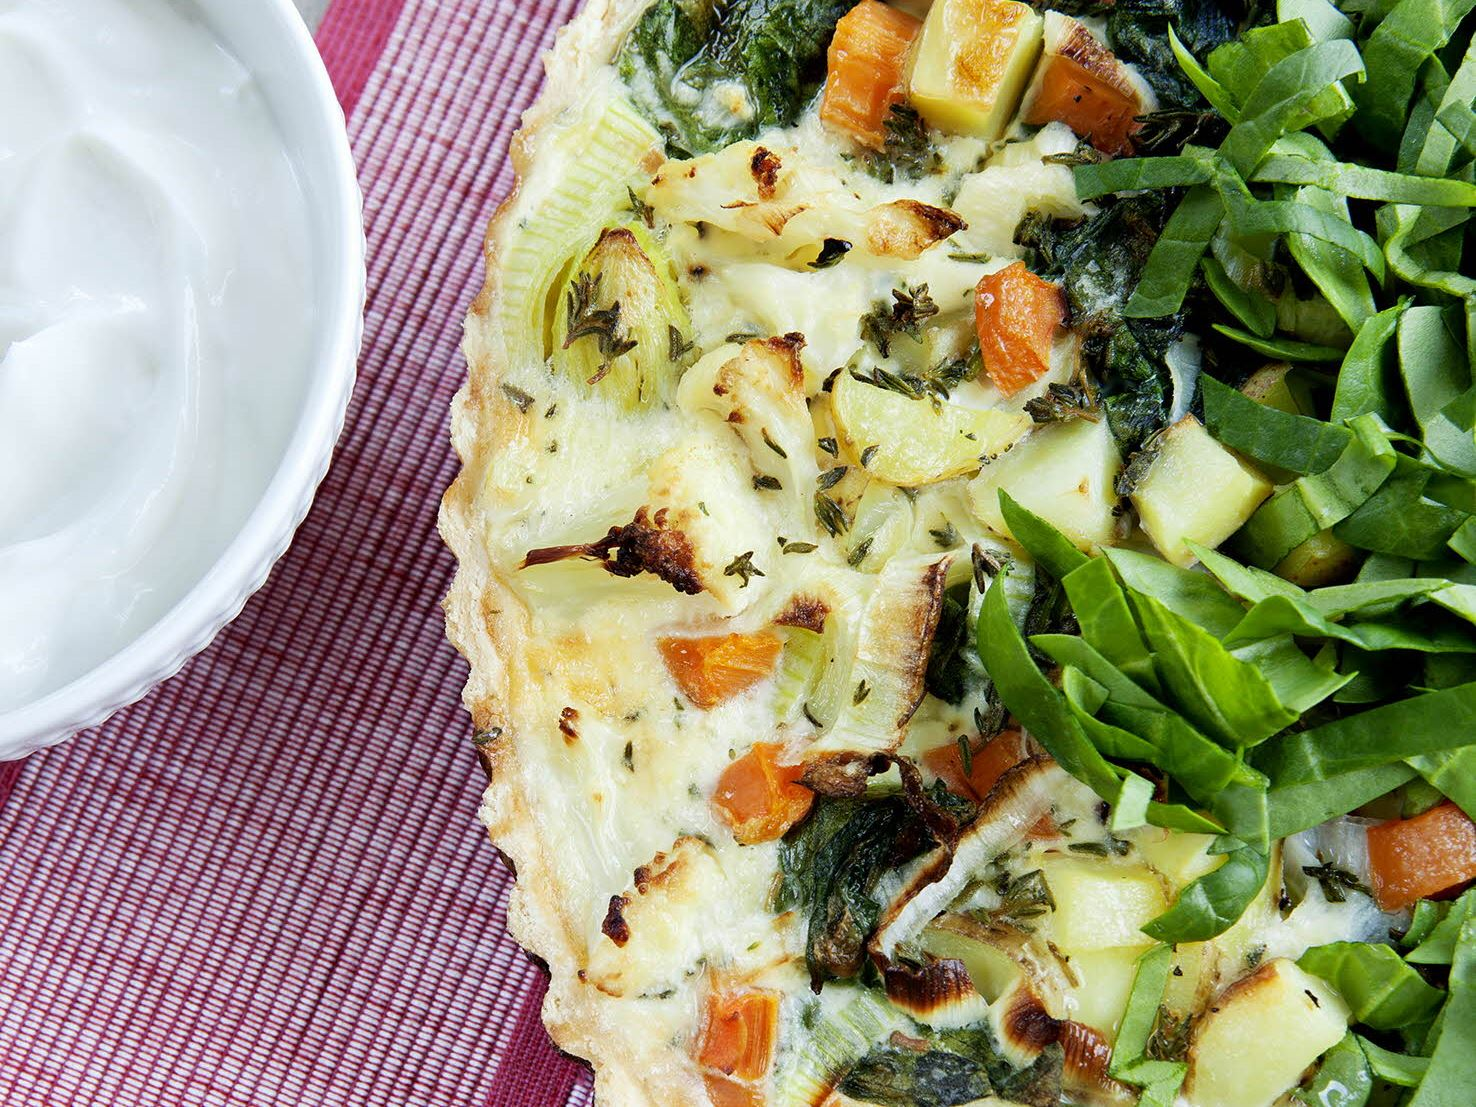 Grøntsagstærte med spinat og kartofler